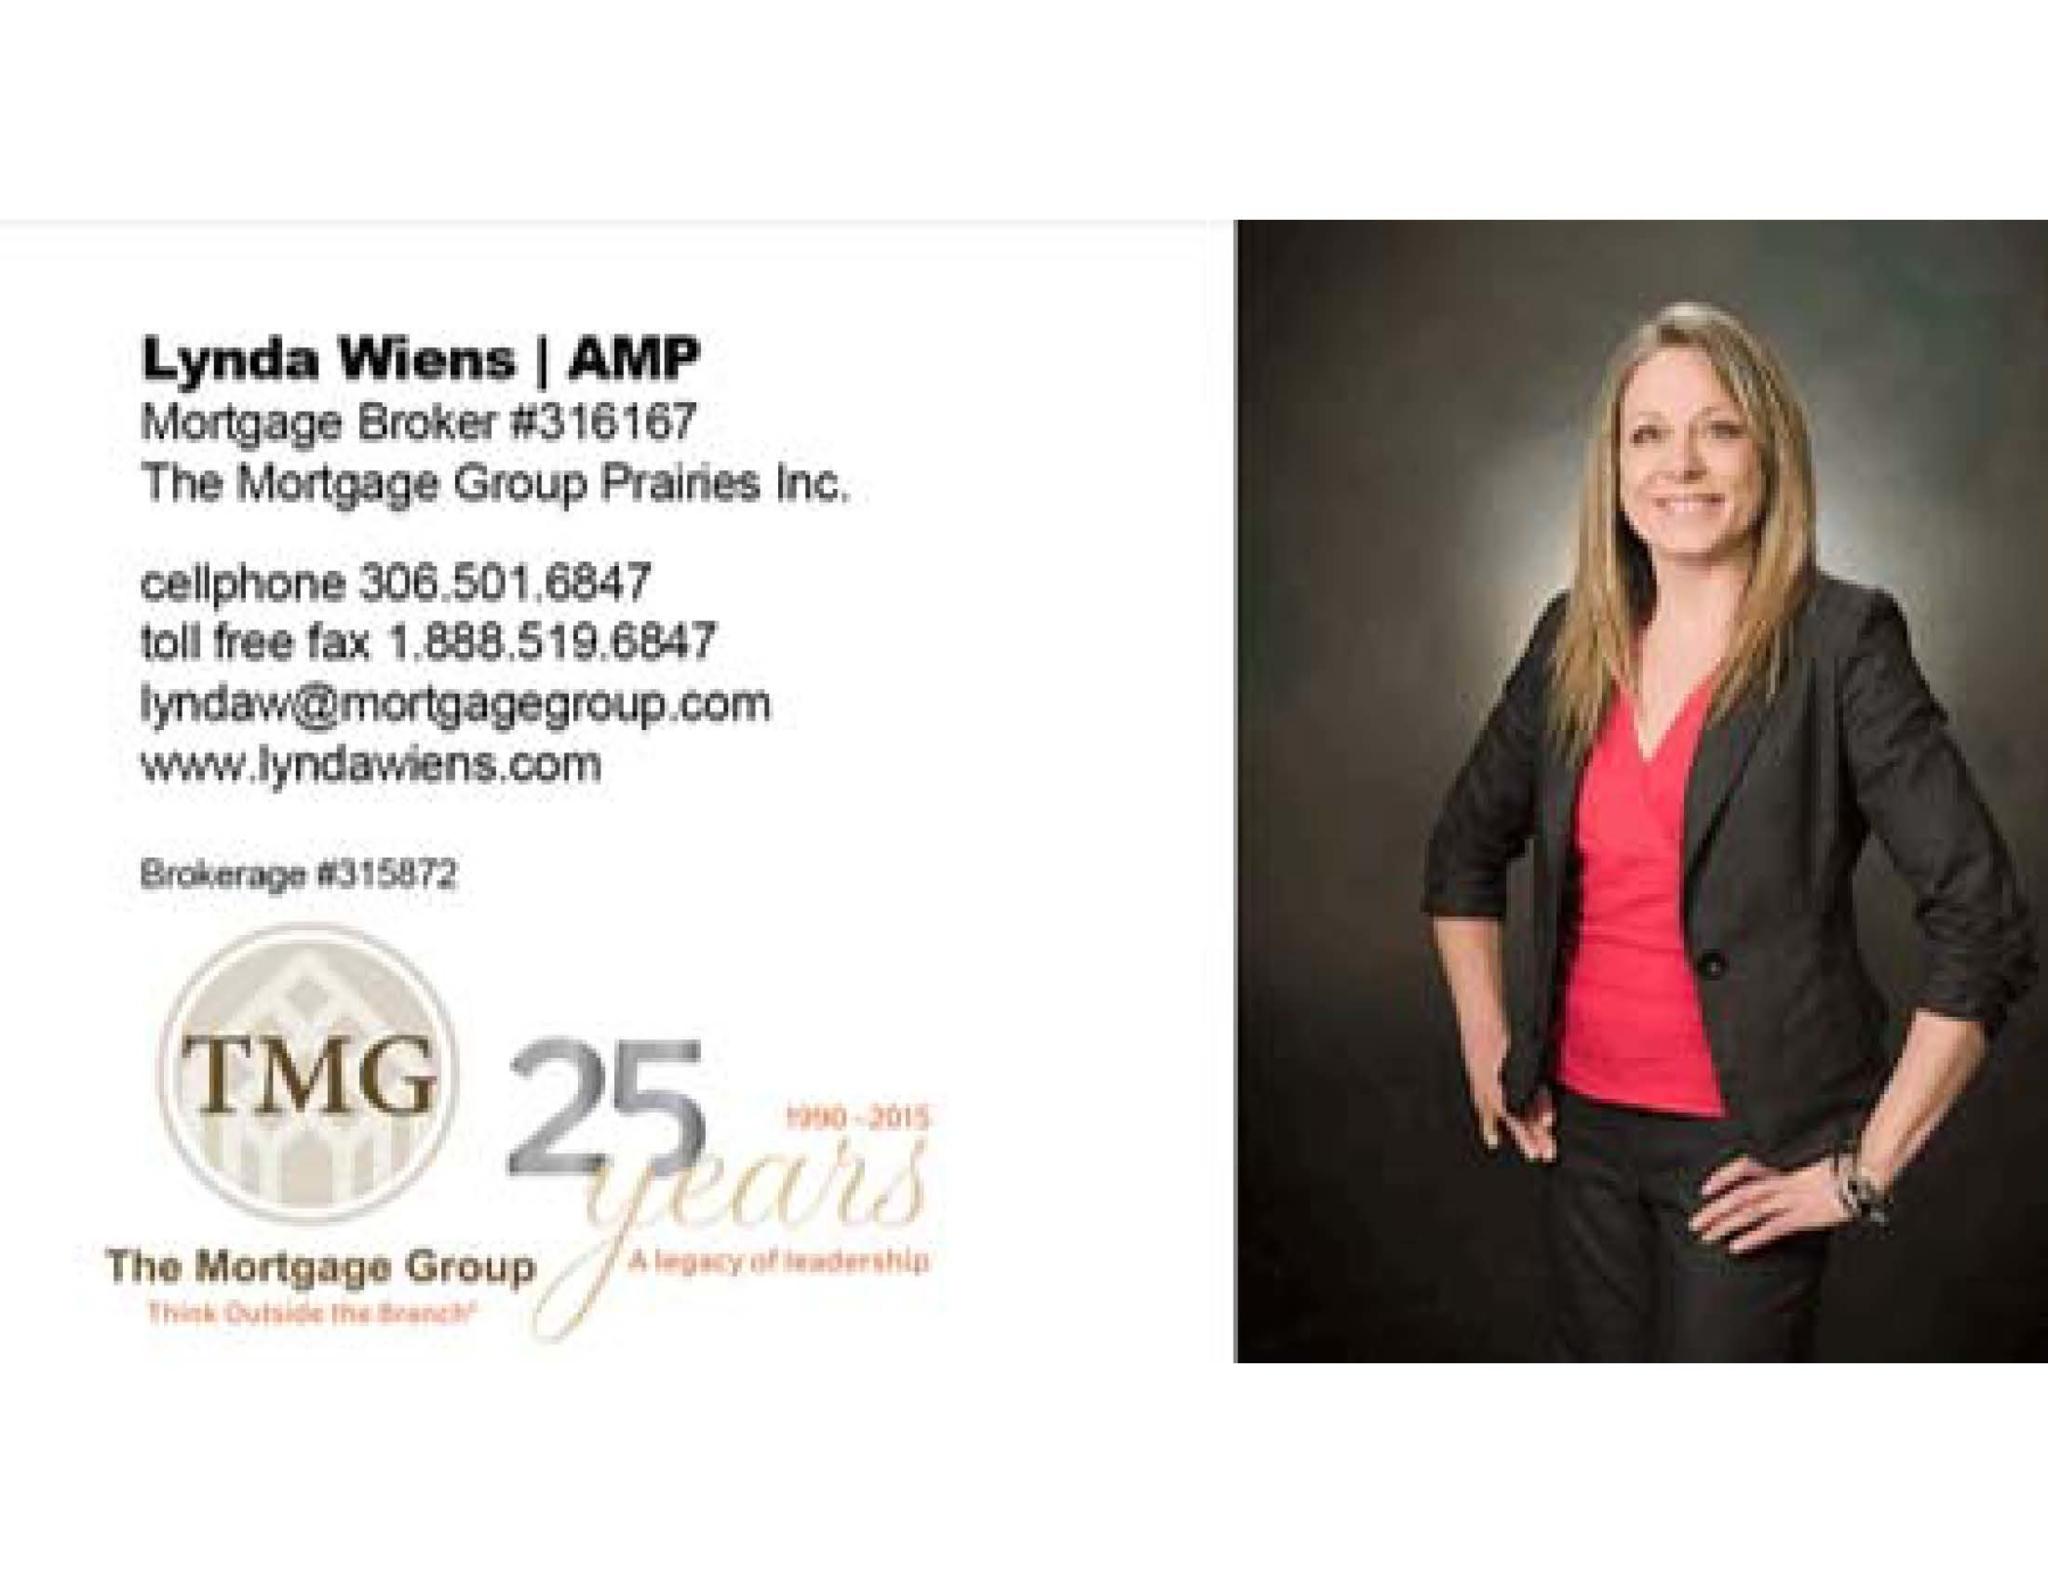 TMG The Mortgage Group - Lynda Wiens